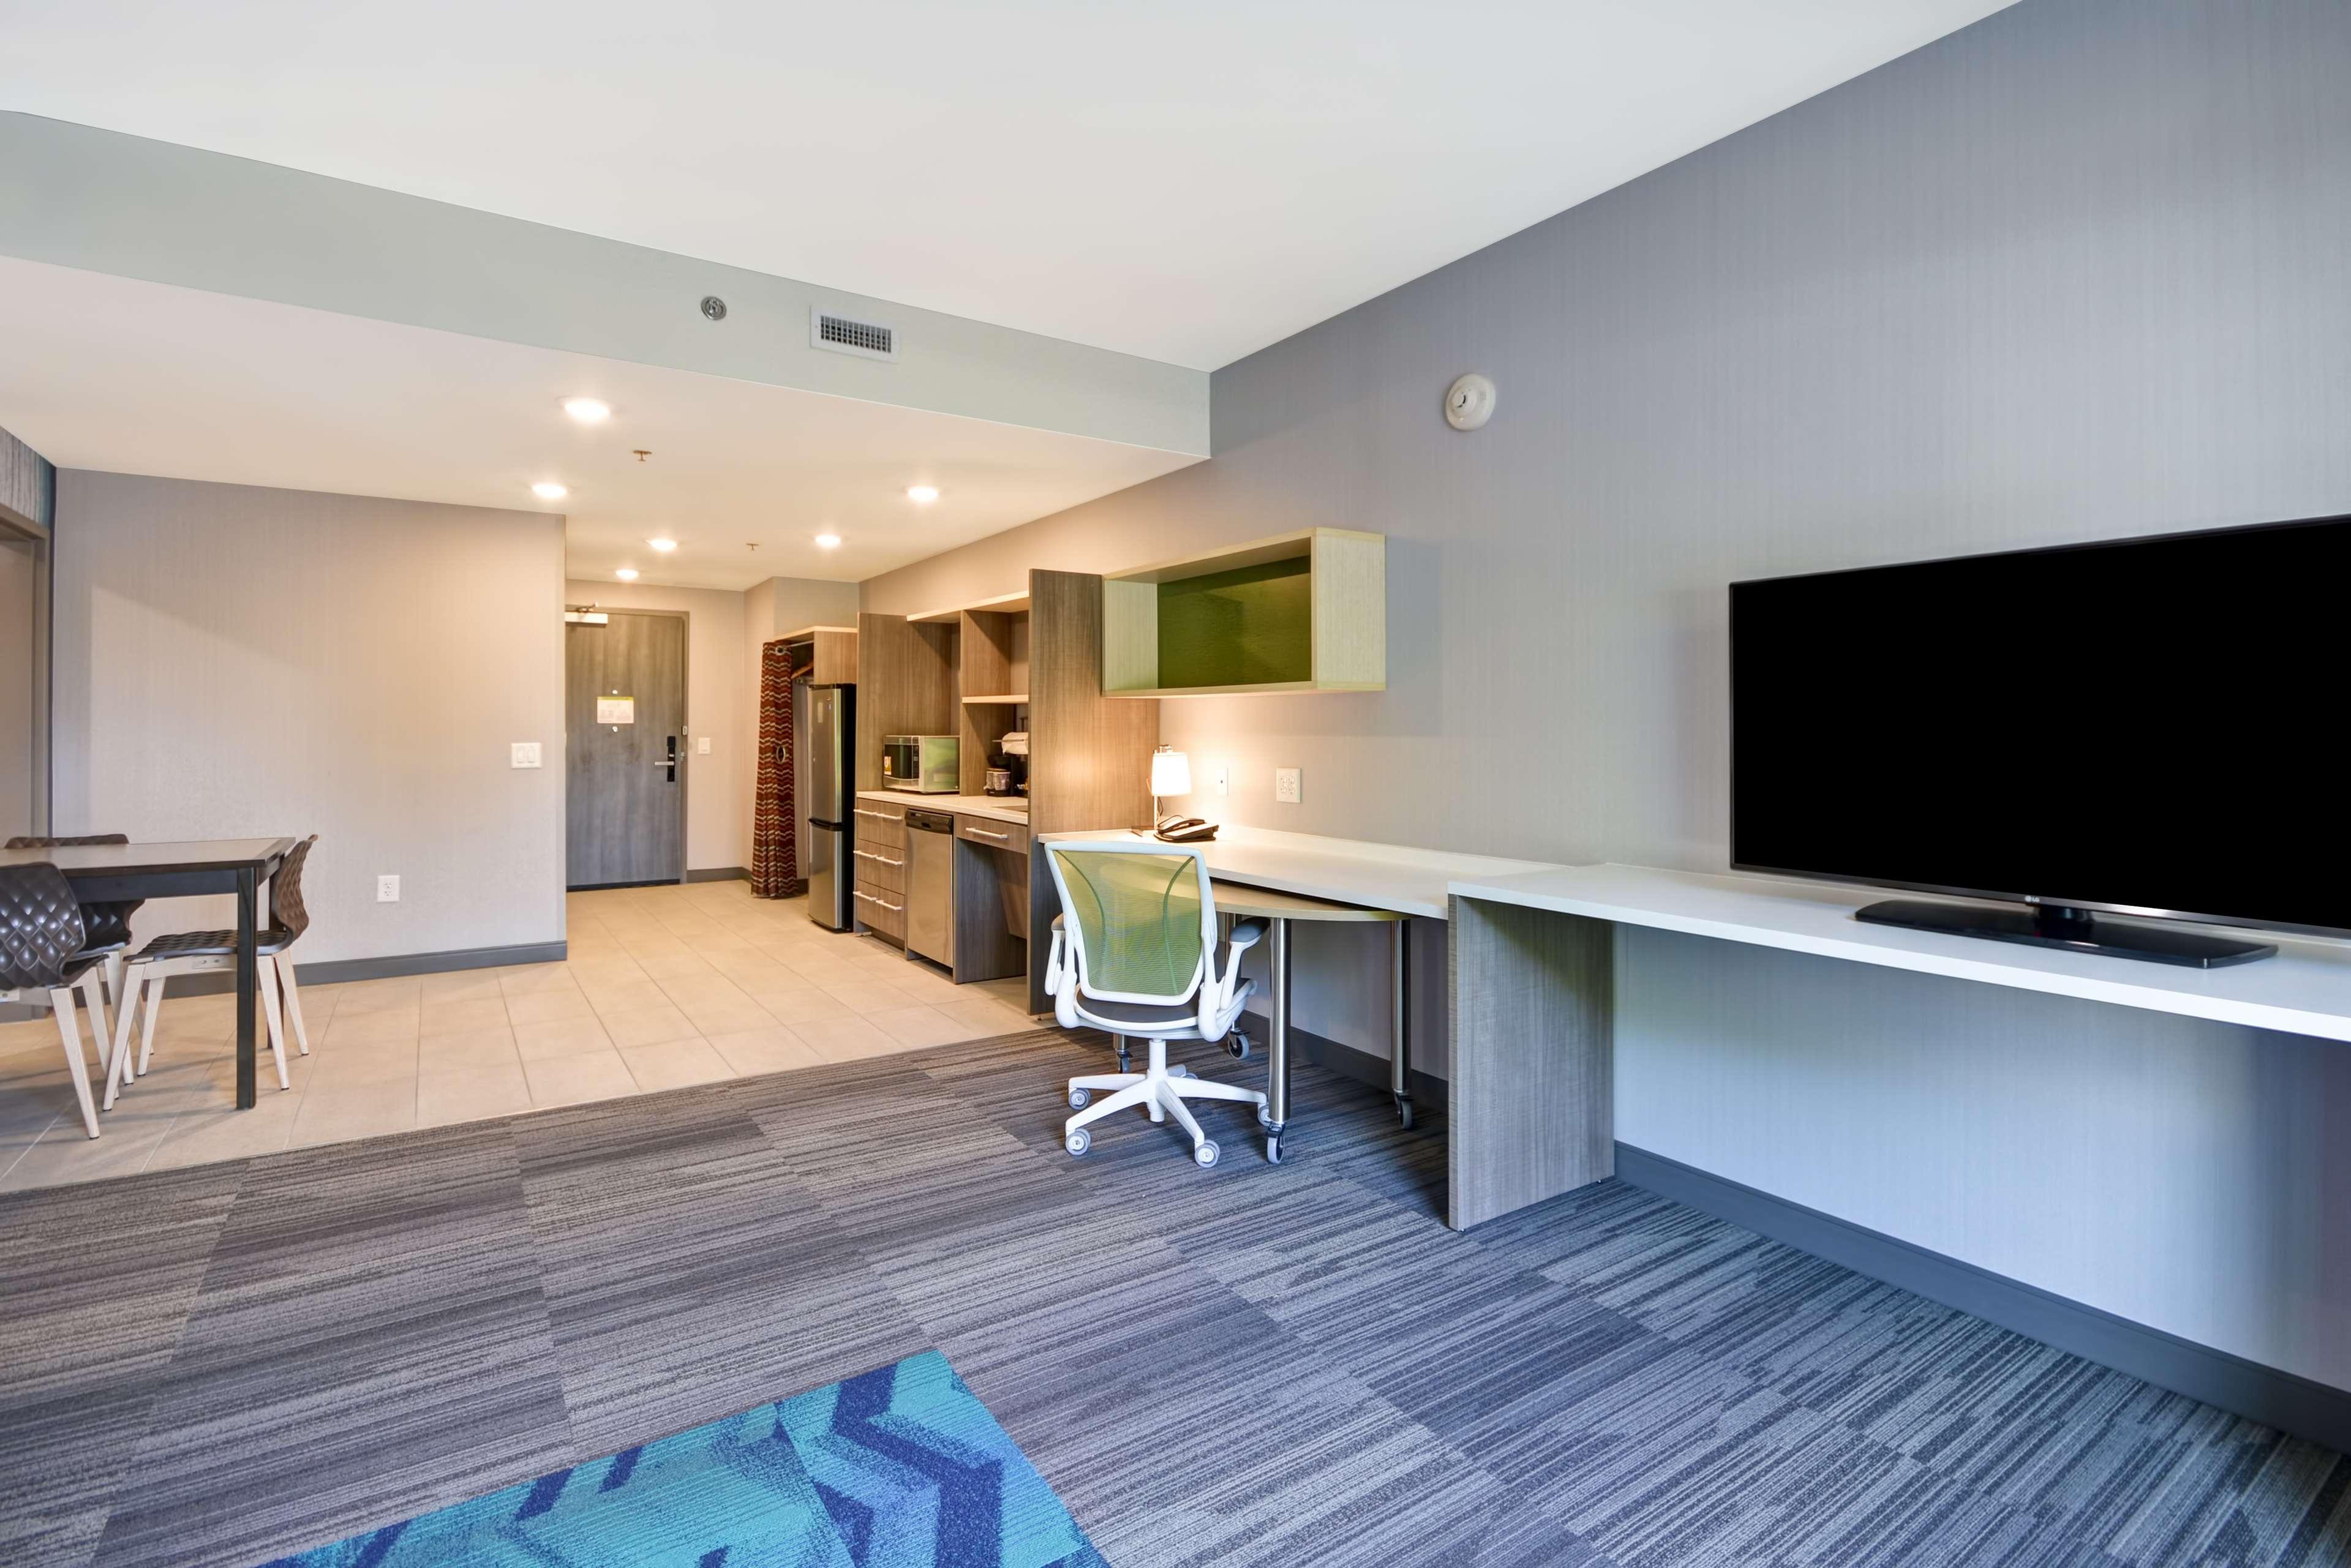 Home2 Suites by Hilton Atlanta West Lithia Springs image 28